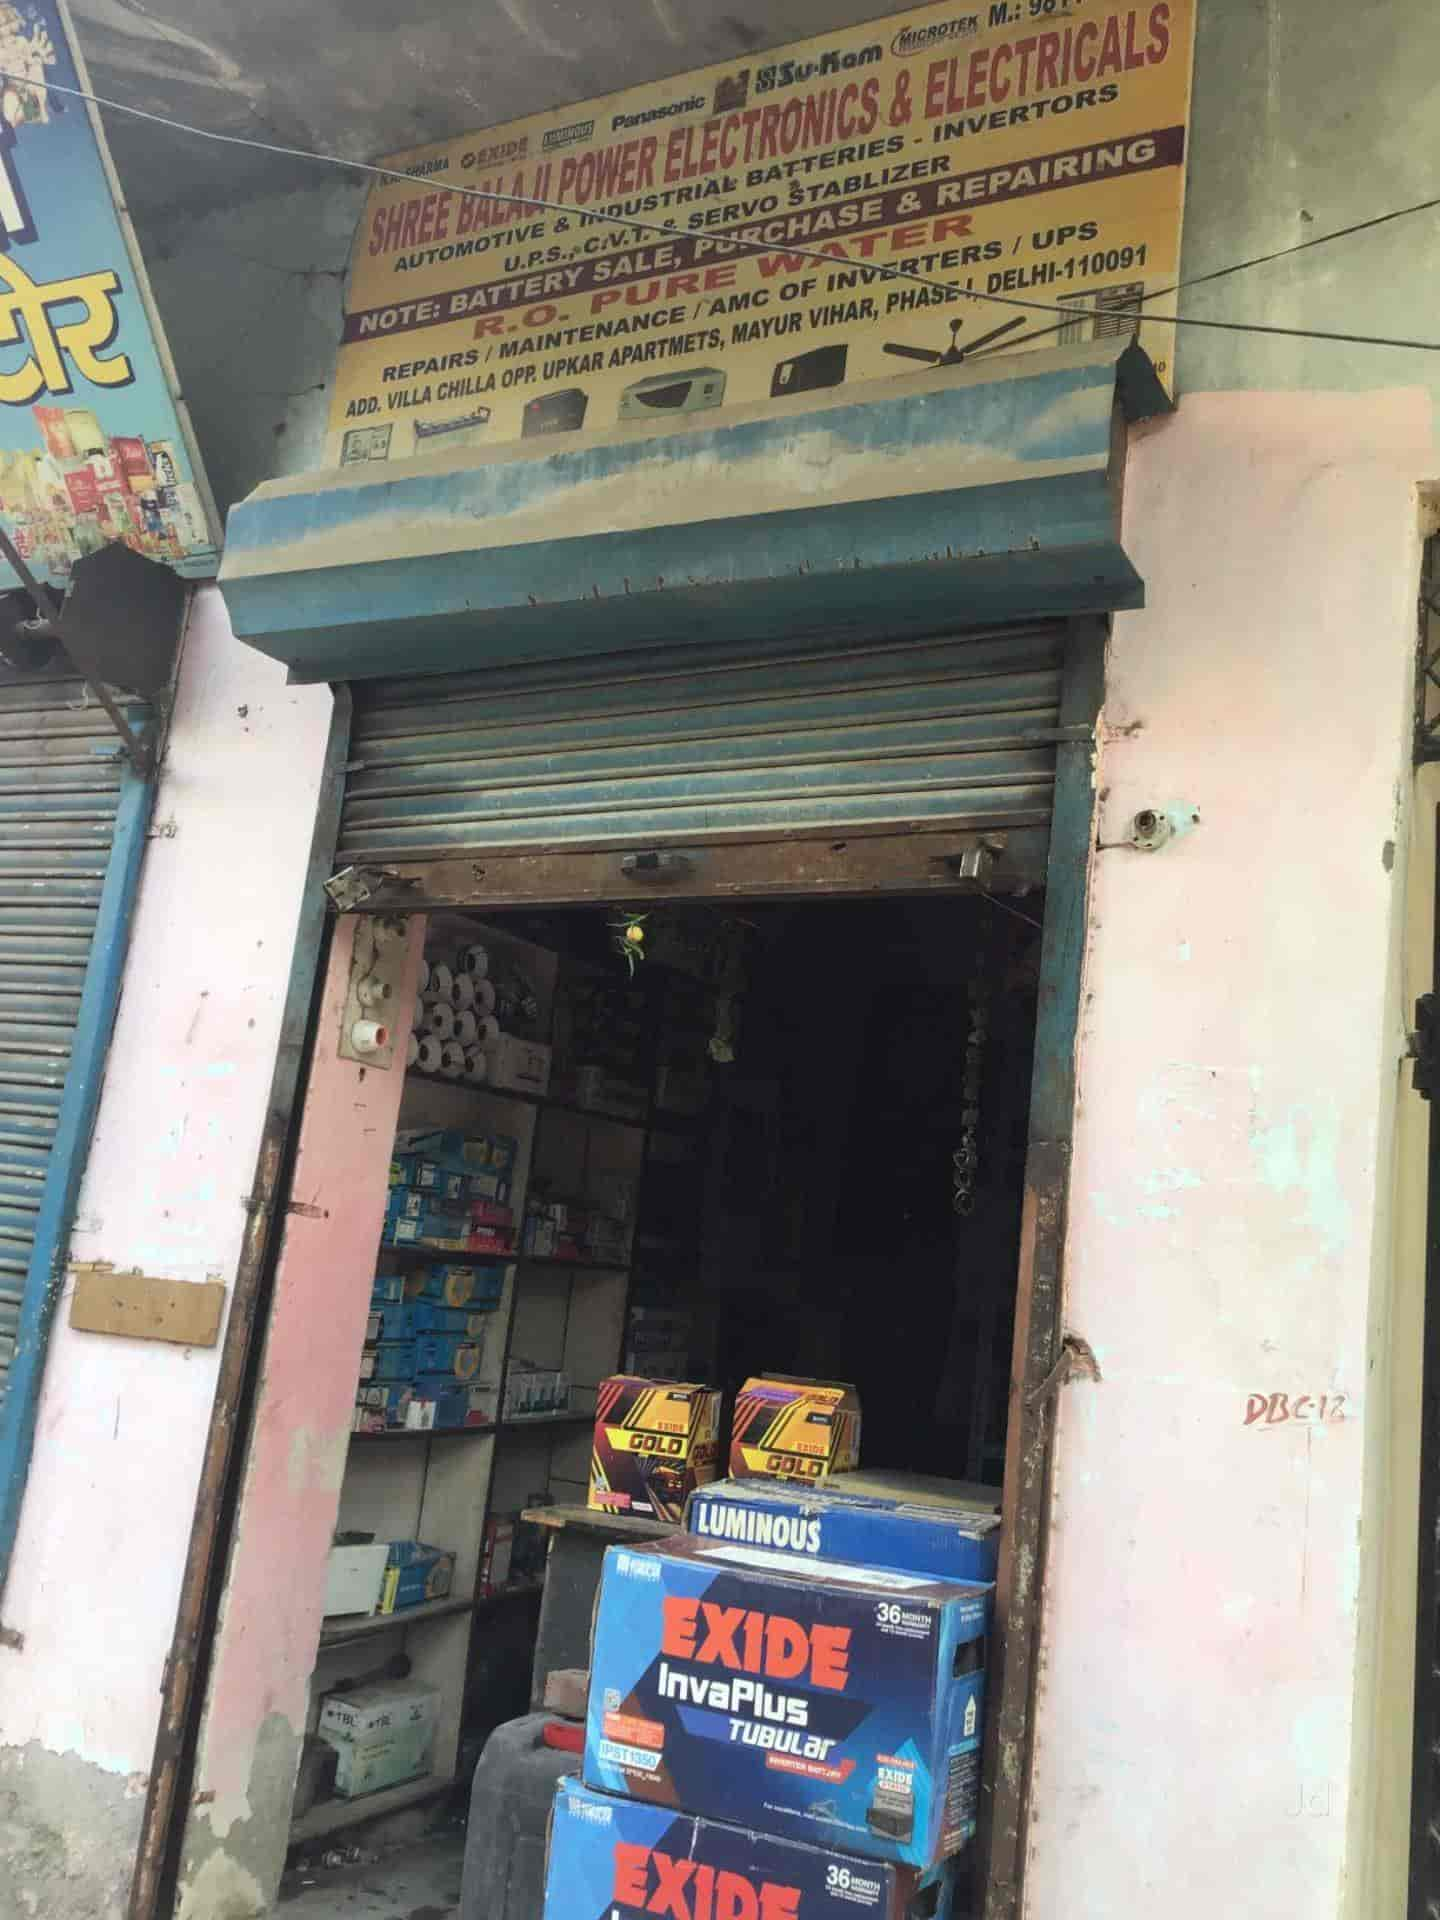 Shri Balaji Power Electronics & Electrcals, Mayur Vihar